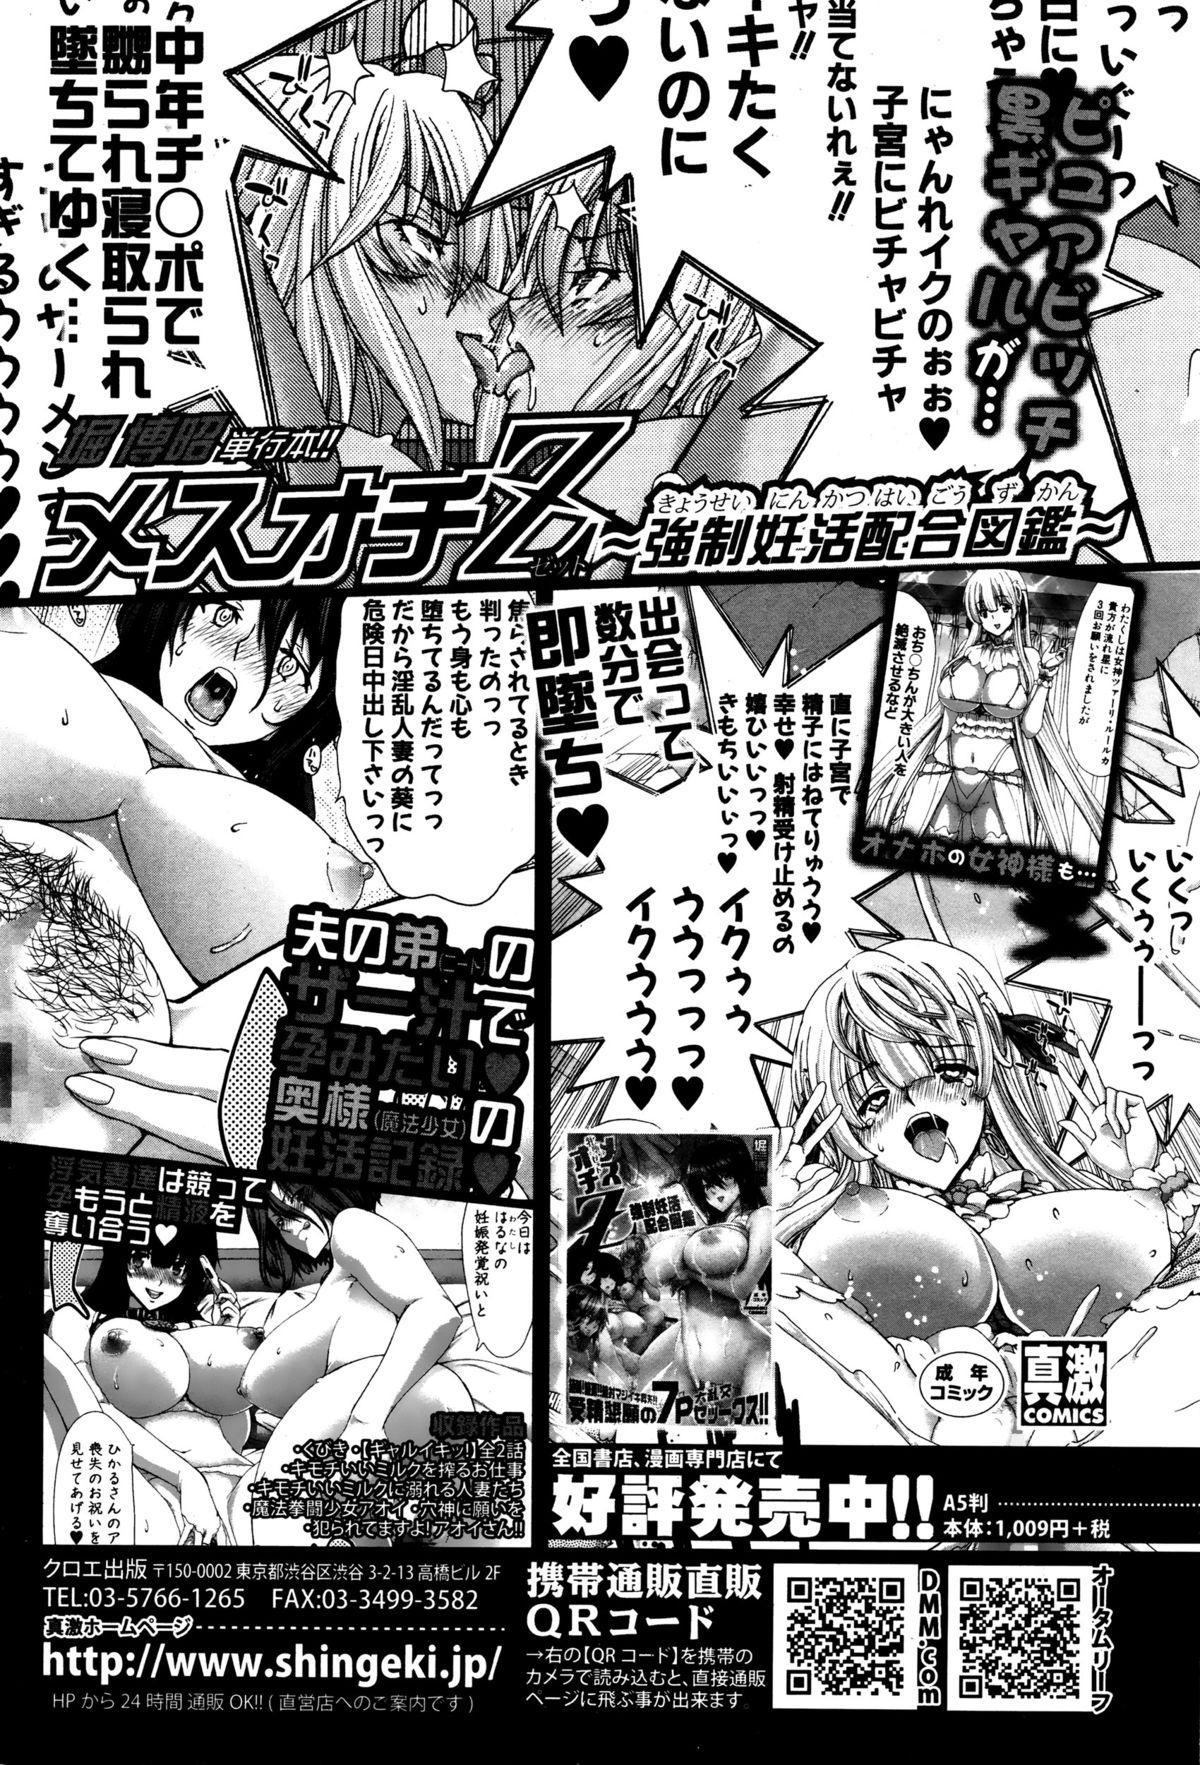 COMIC Shingeki 2016-01 97